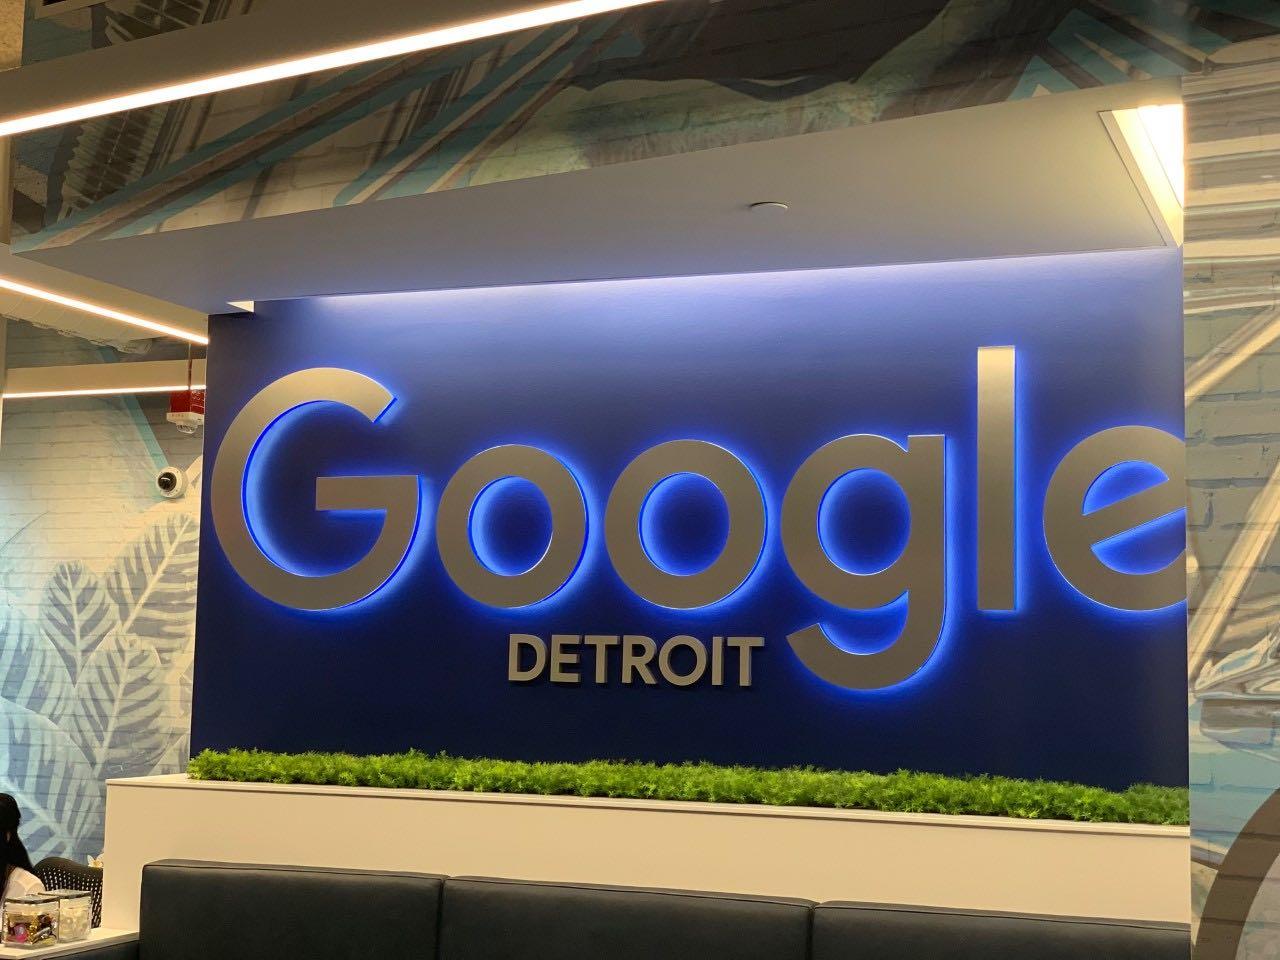 Google Detroit